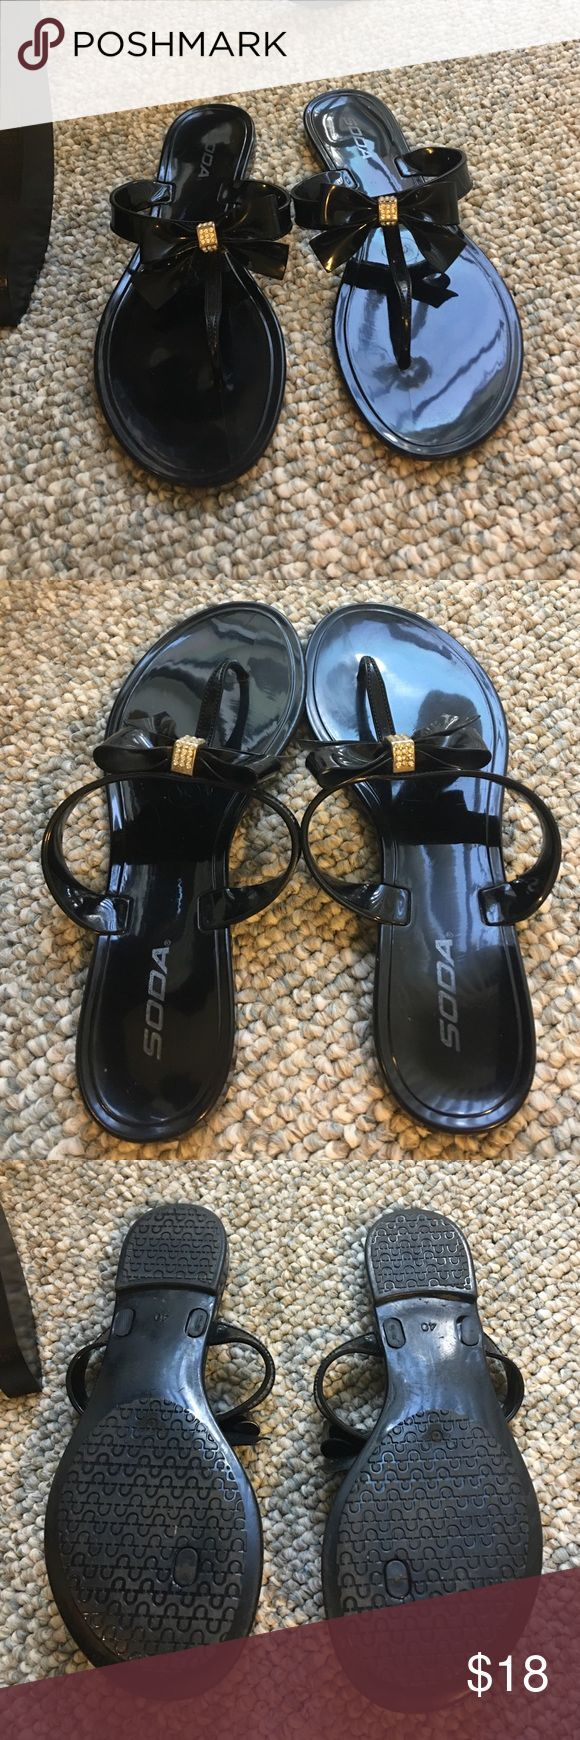 1000 Ideas About Rhinestone Sandals On Pinterest